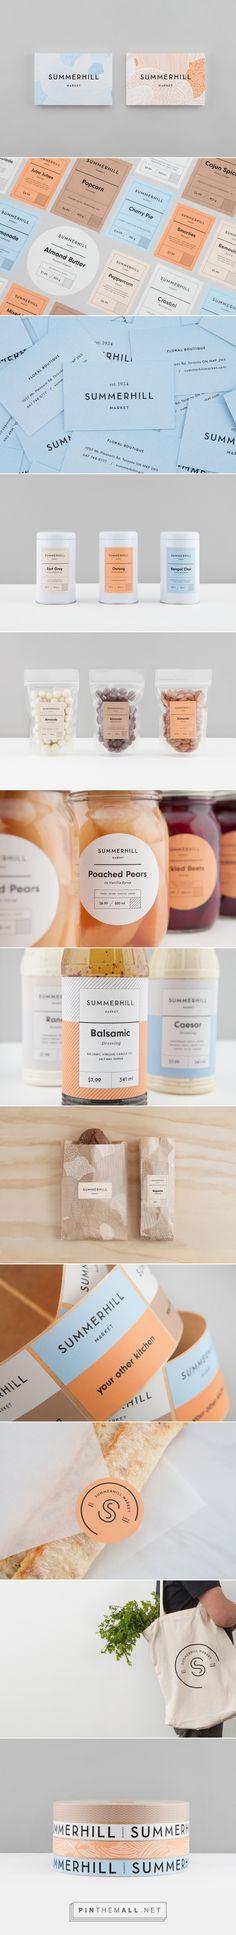 New Brand Identity for Summerhill Market by Blok — BP&O - created via https://pinthemall.net